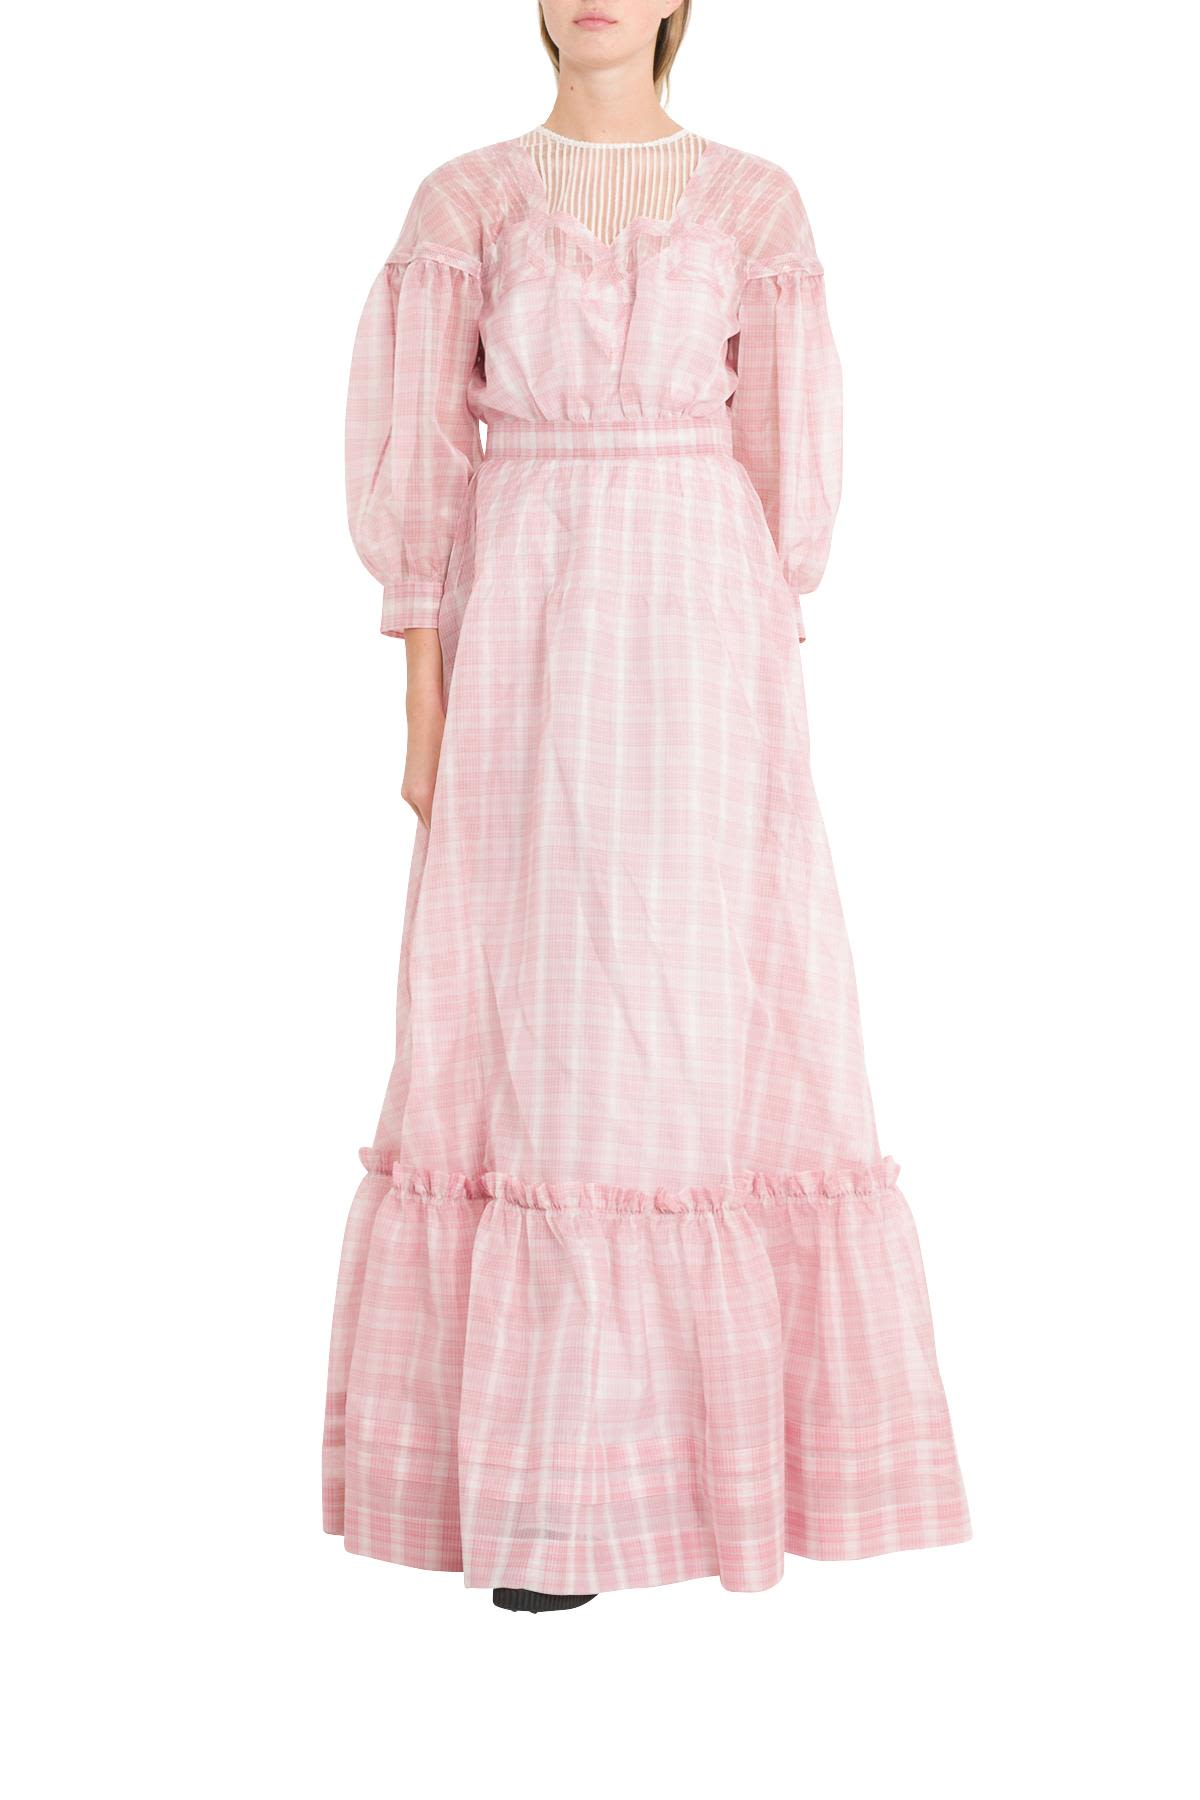 Calvin Klein LONG CHECK PINK DRESS